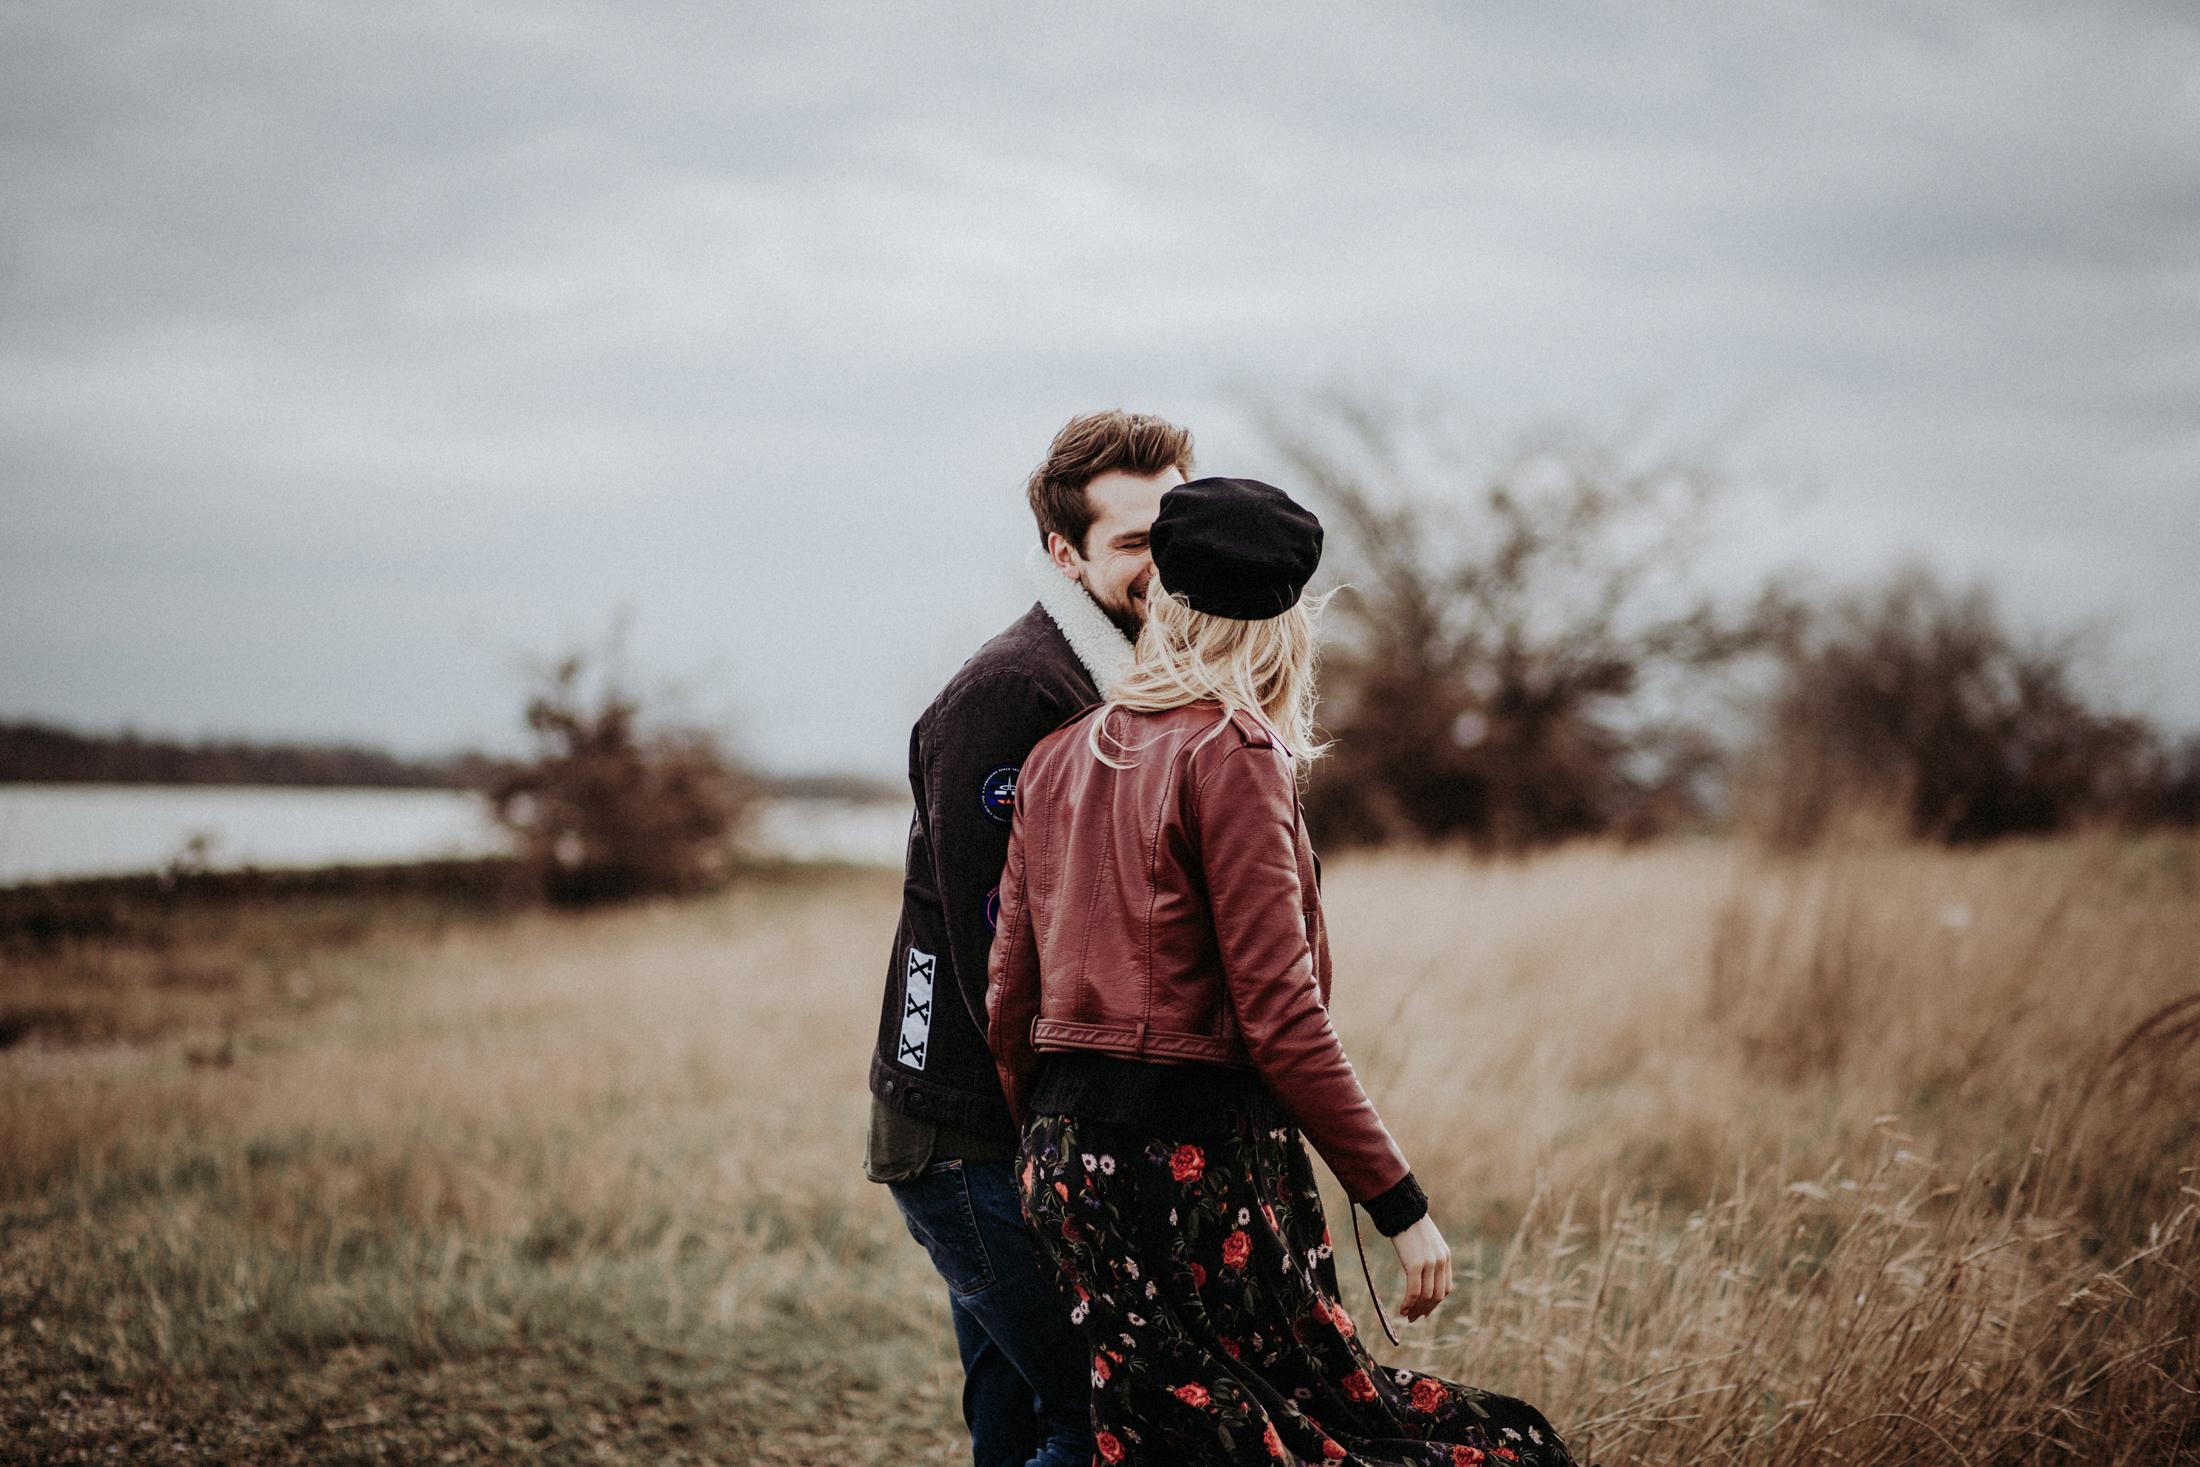 Wedding_Photographer_Mallorca_DanielaMarquardt_Photography_CanaryIslands_Lanzarote_Iceland_Tuscany_Santorini_Portugal_NewYork_Spain_Elopement_Hochzeitsfotograf_CK120